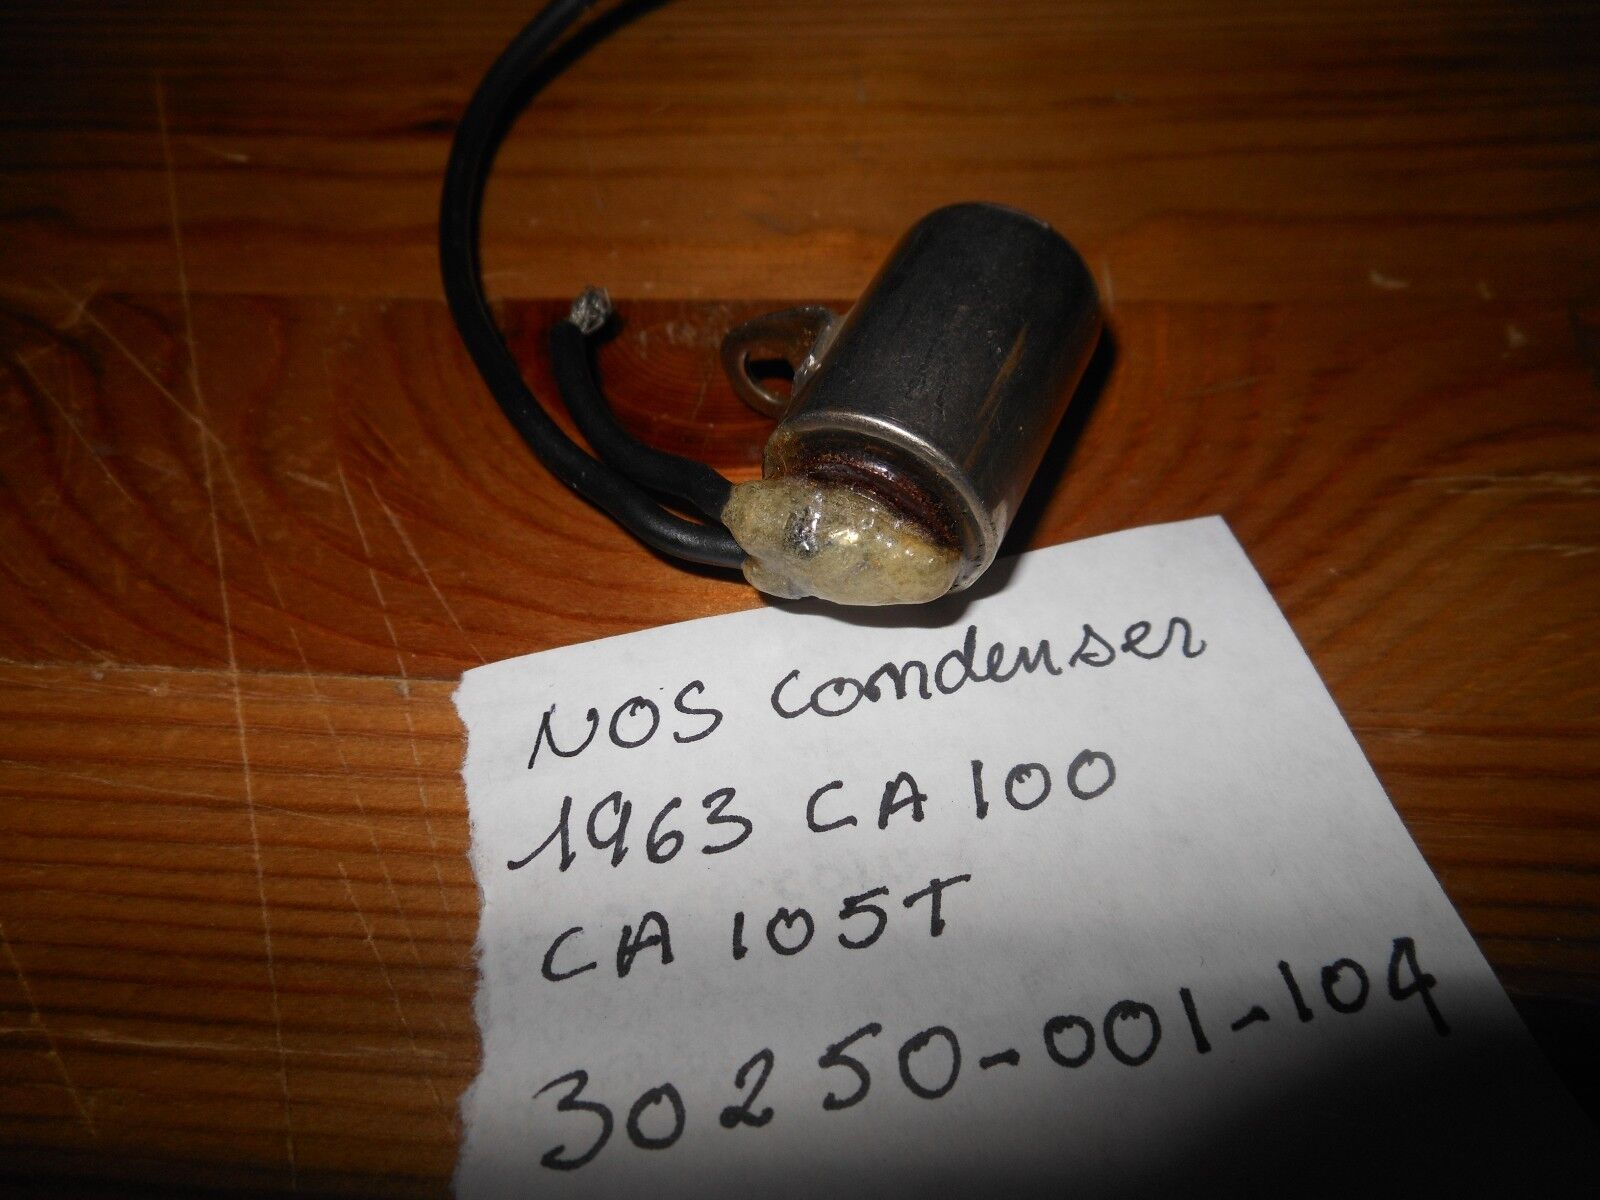 NOS OEM Honda 1963 CA100 CA105T CA110 Ignition Condenser # 30250-001-104